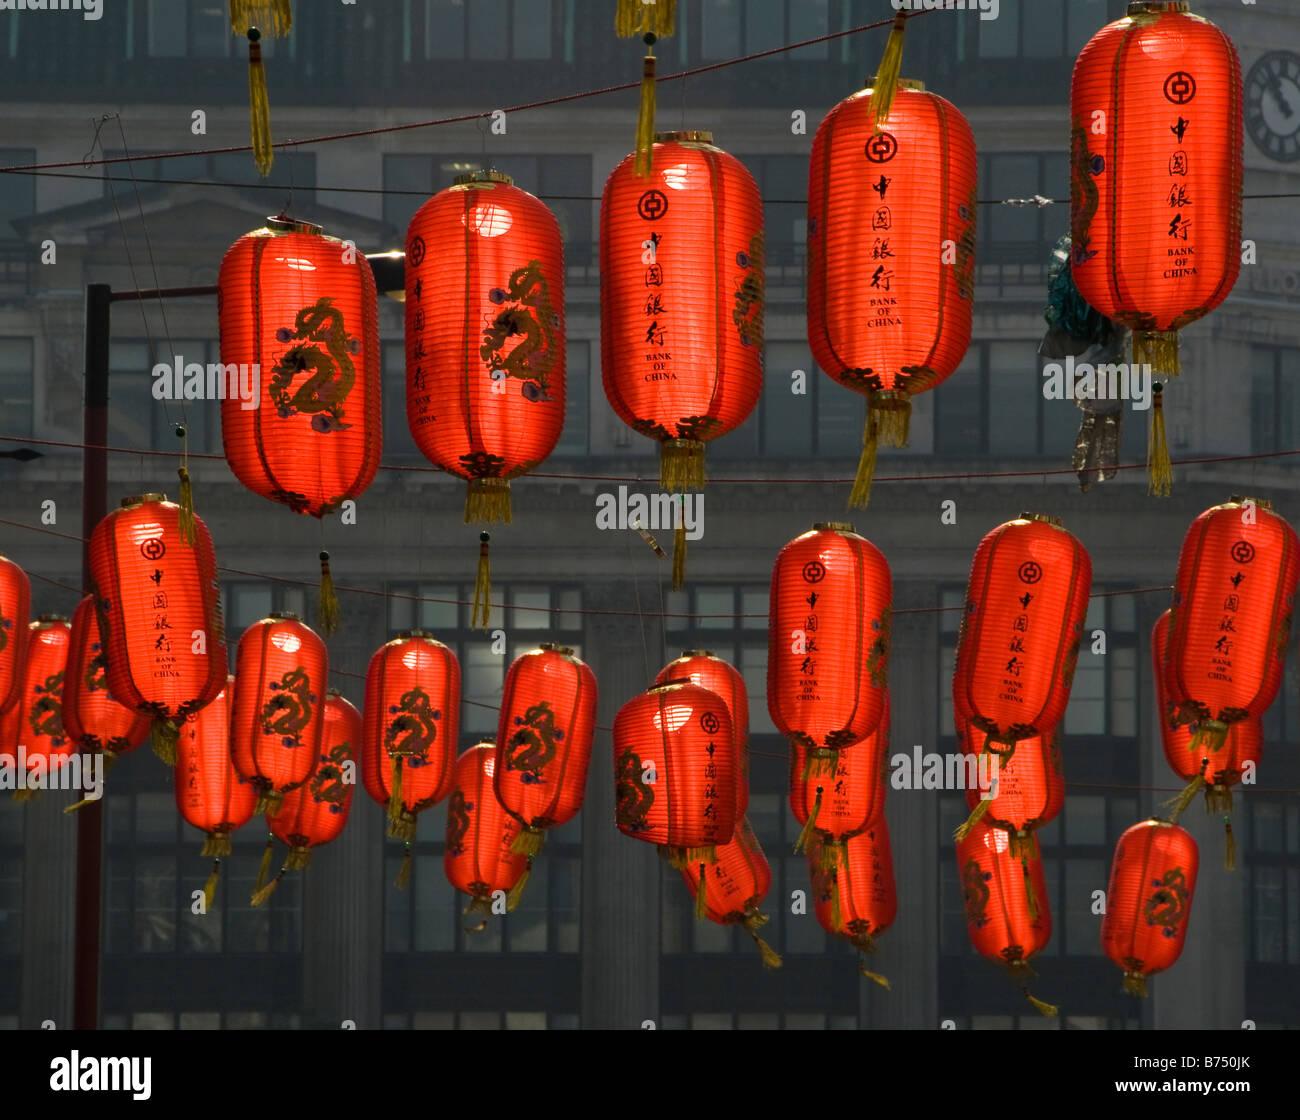 Colourful lanterns in Chinatown, London, UK Stock Photo